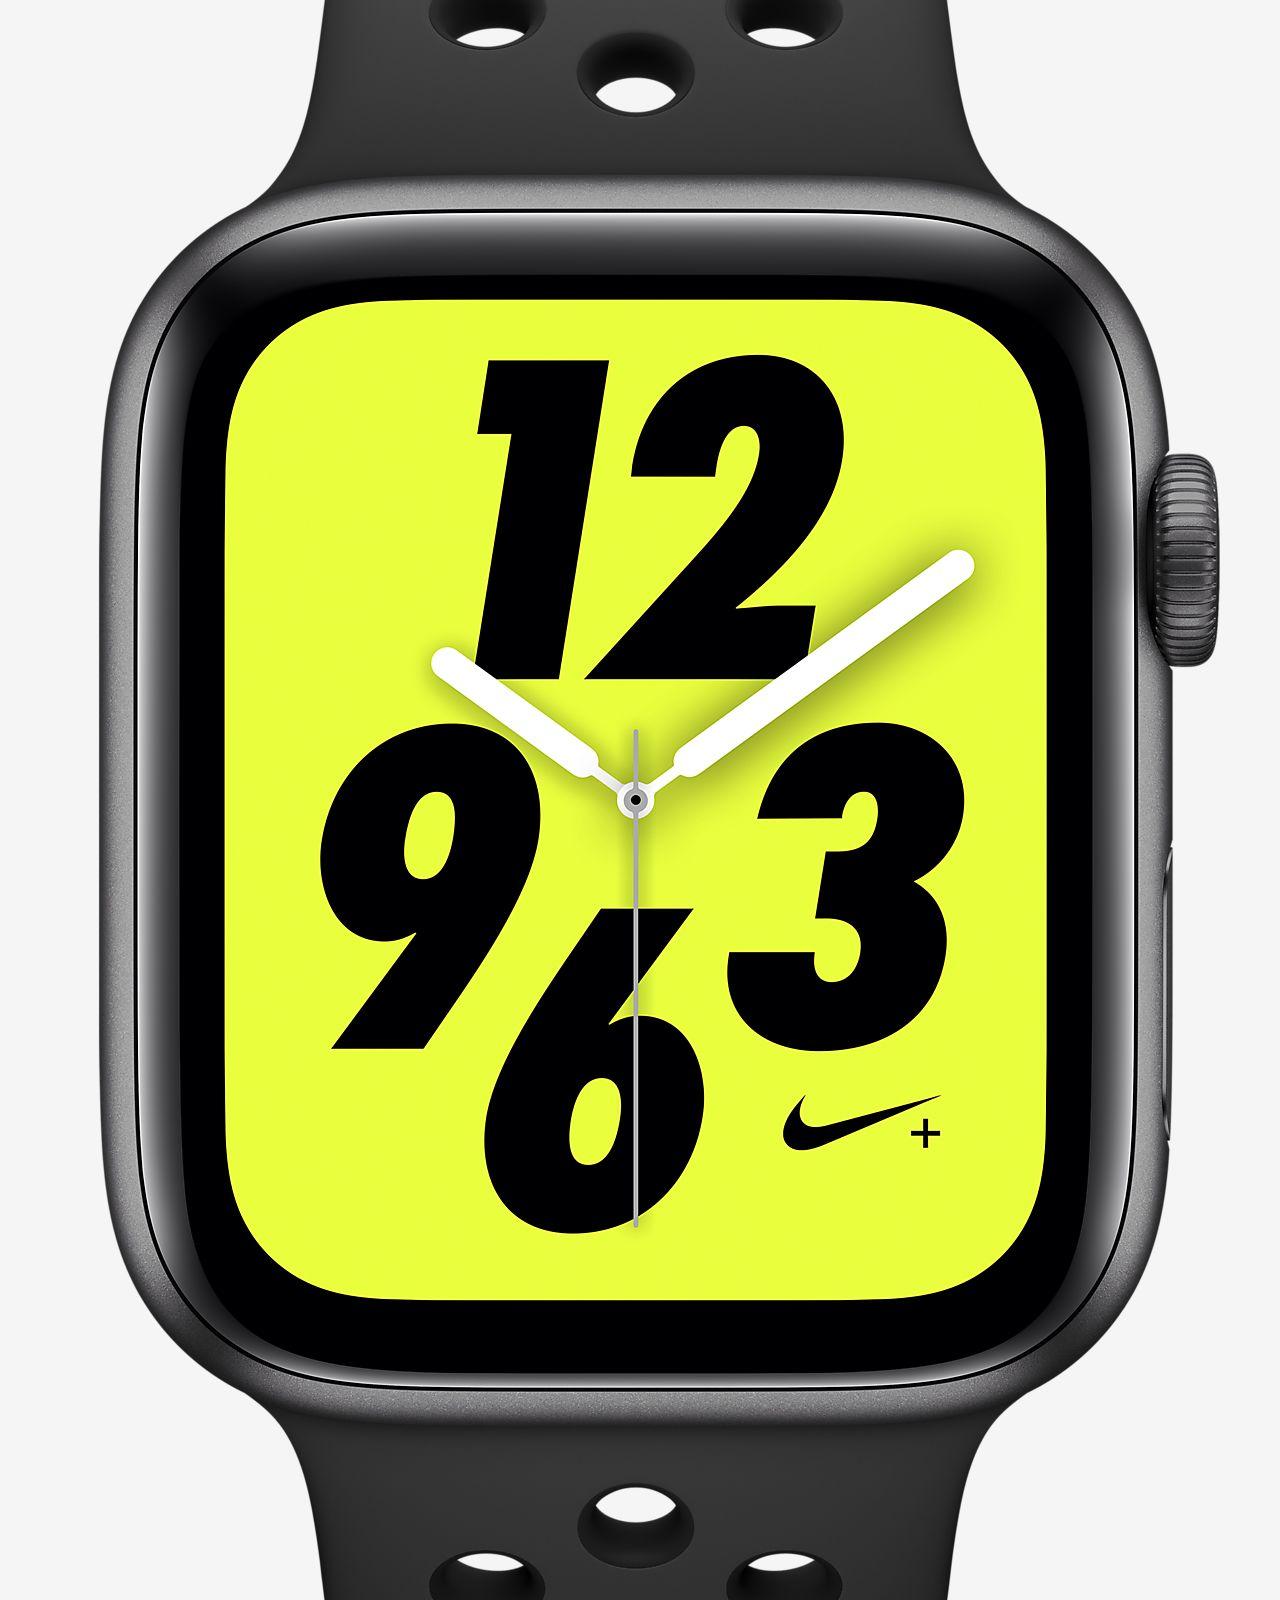 9a14e29f8ca8 ... Apple Watch Nike+ Series 4 (GPS) con correa Nike Sport Band Reloj  deportivo de